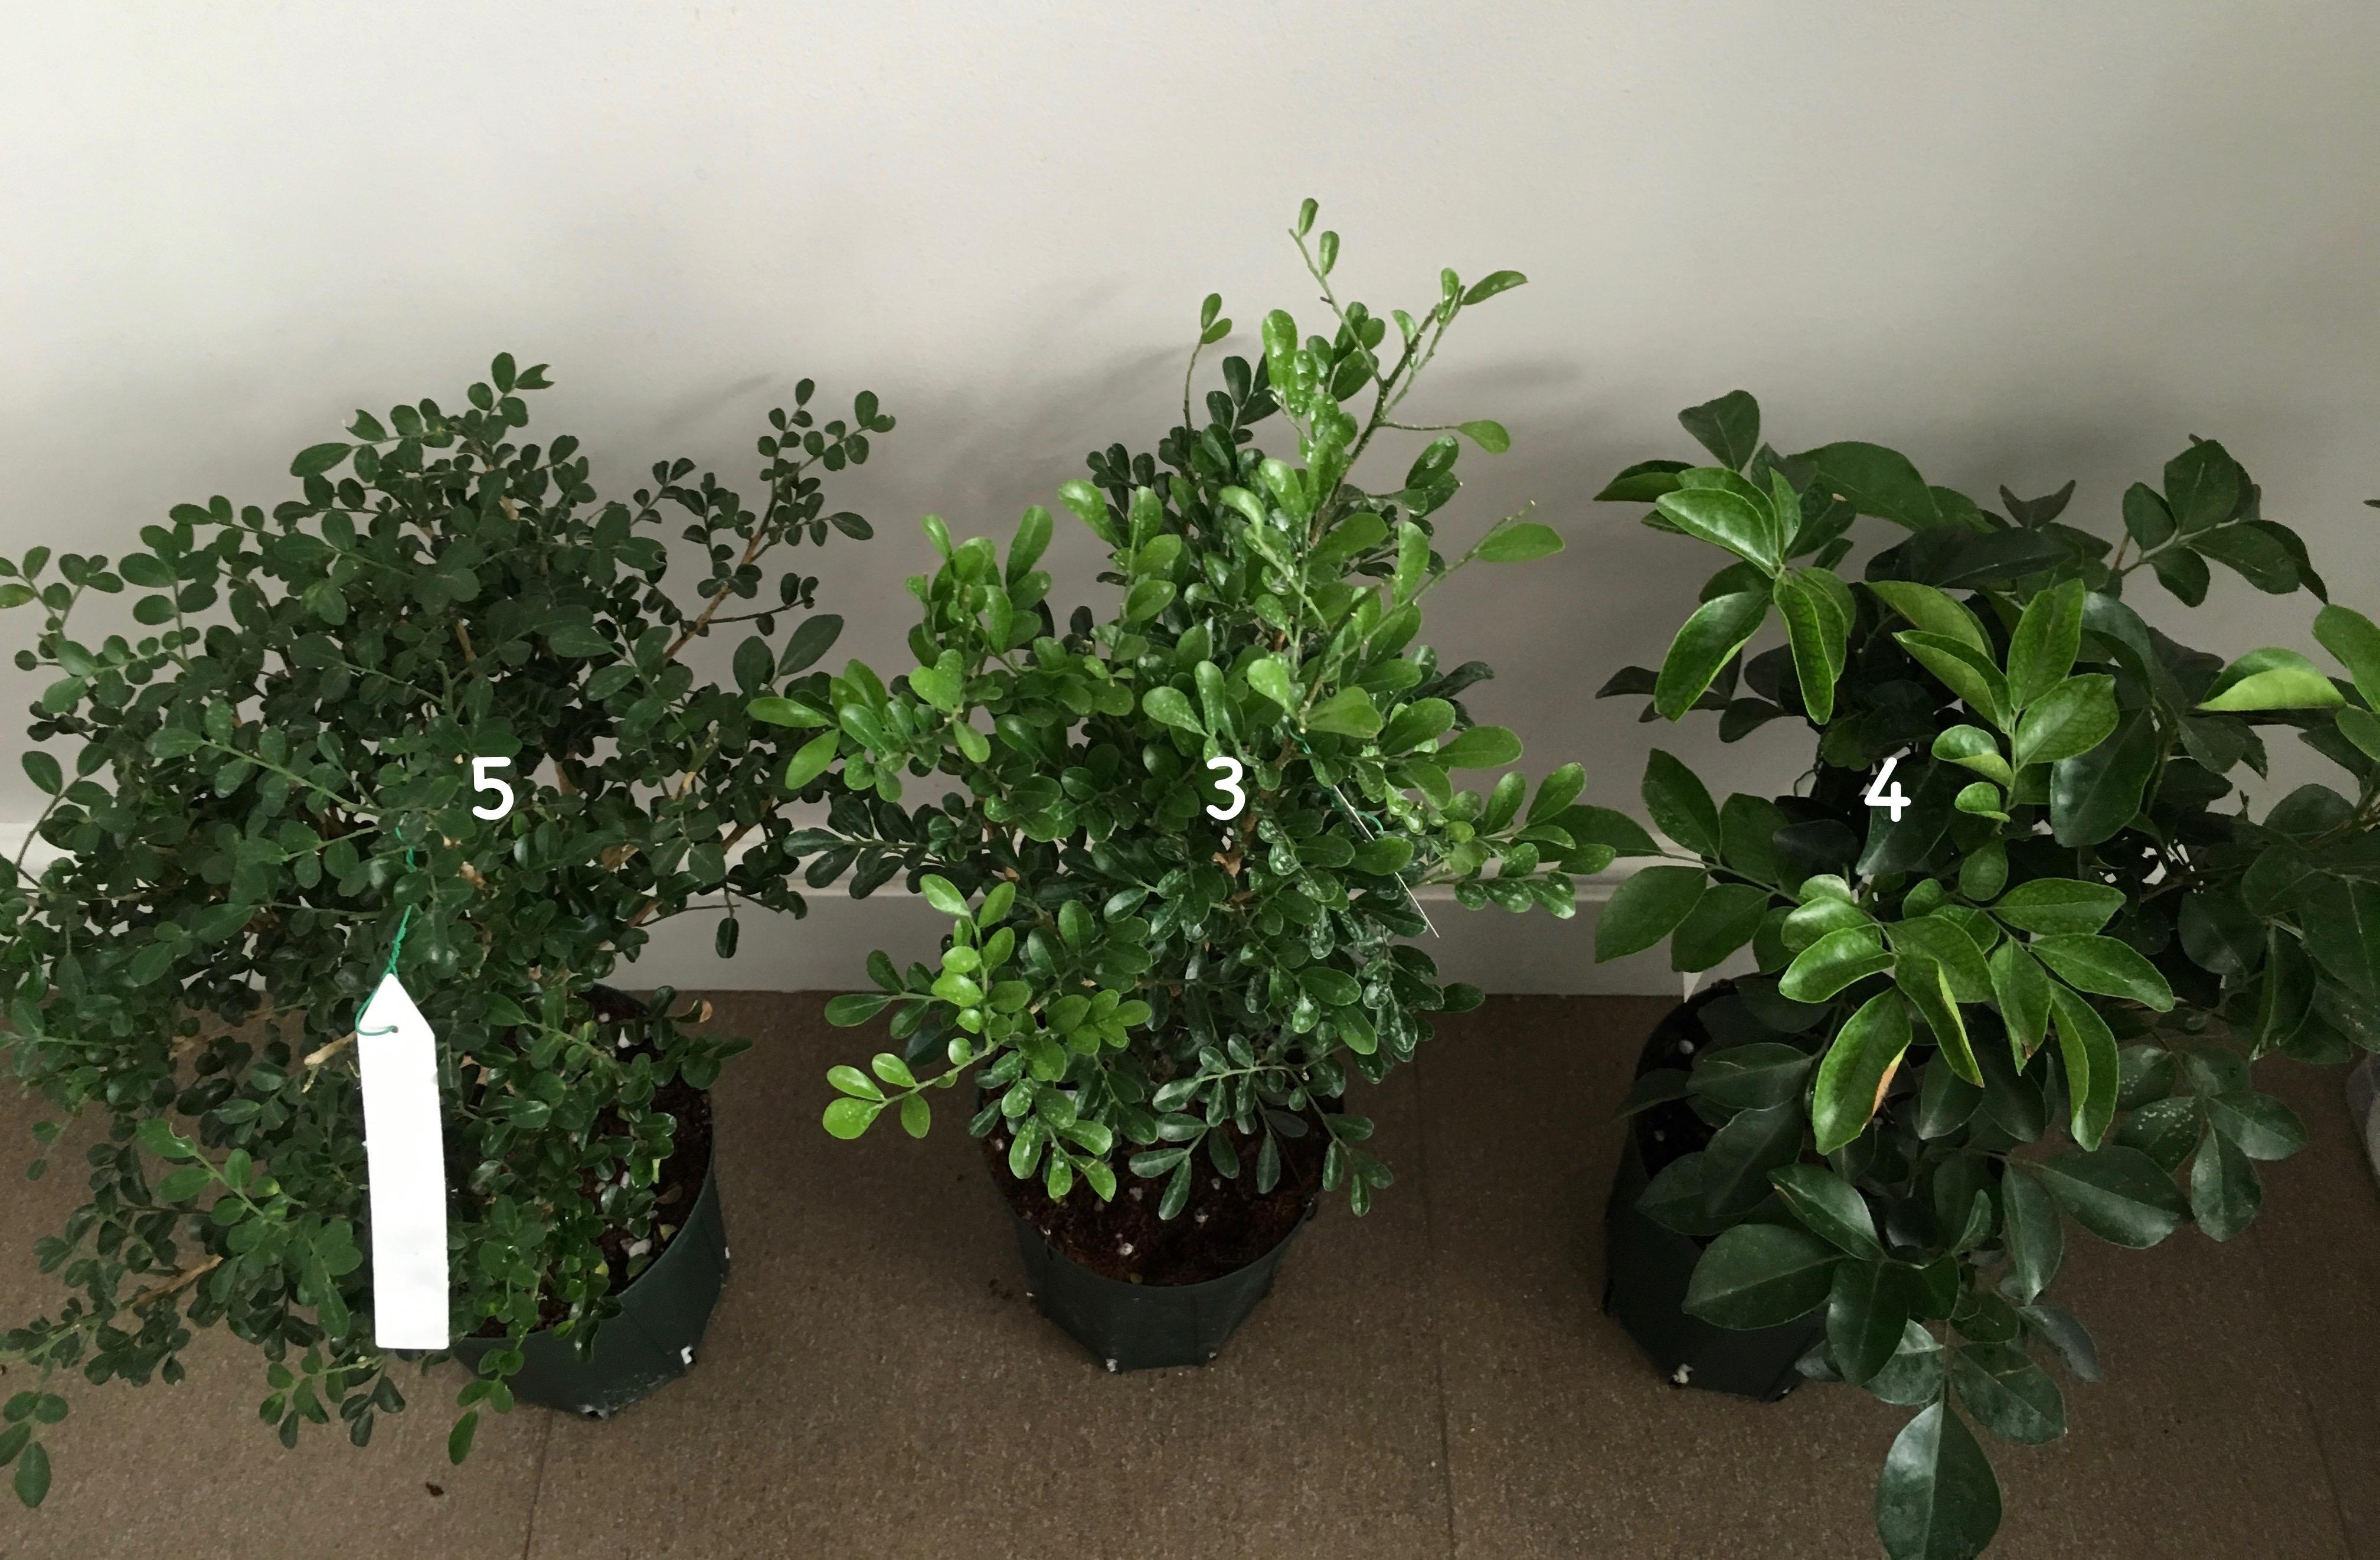 Murraya 'Mim-a-min' Dwarf (mutation) (слева) Murraya paniculata «Min-a-min» dwarf (в центре) Murraya paniculata 'Min-a-min' (big leaf) (справа)